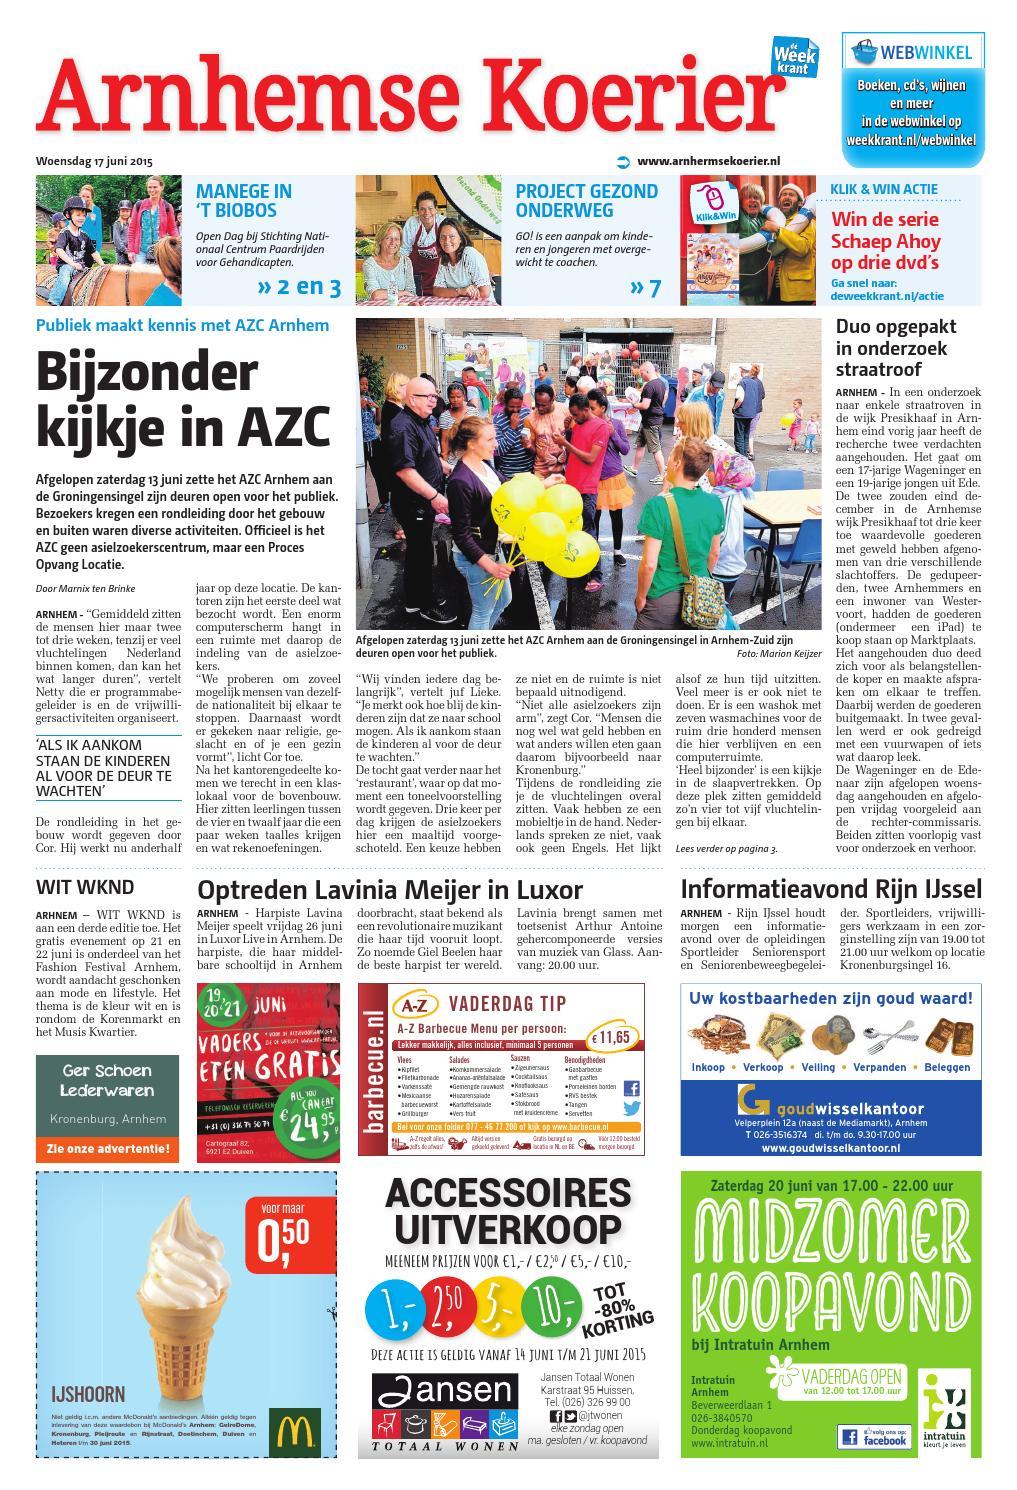 Tuinkast Bayern Gratis Bezorgd Nederland.Arnhemse Koerier Week25 By Wegener Issuu